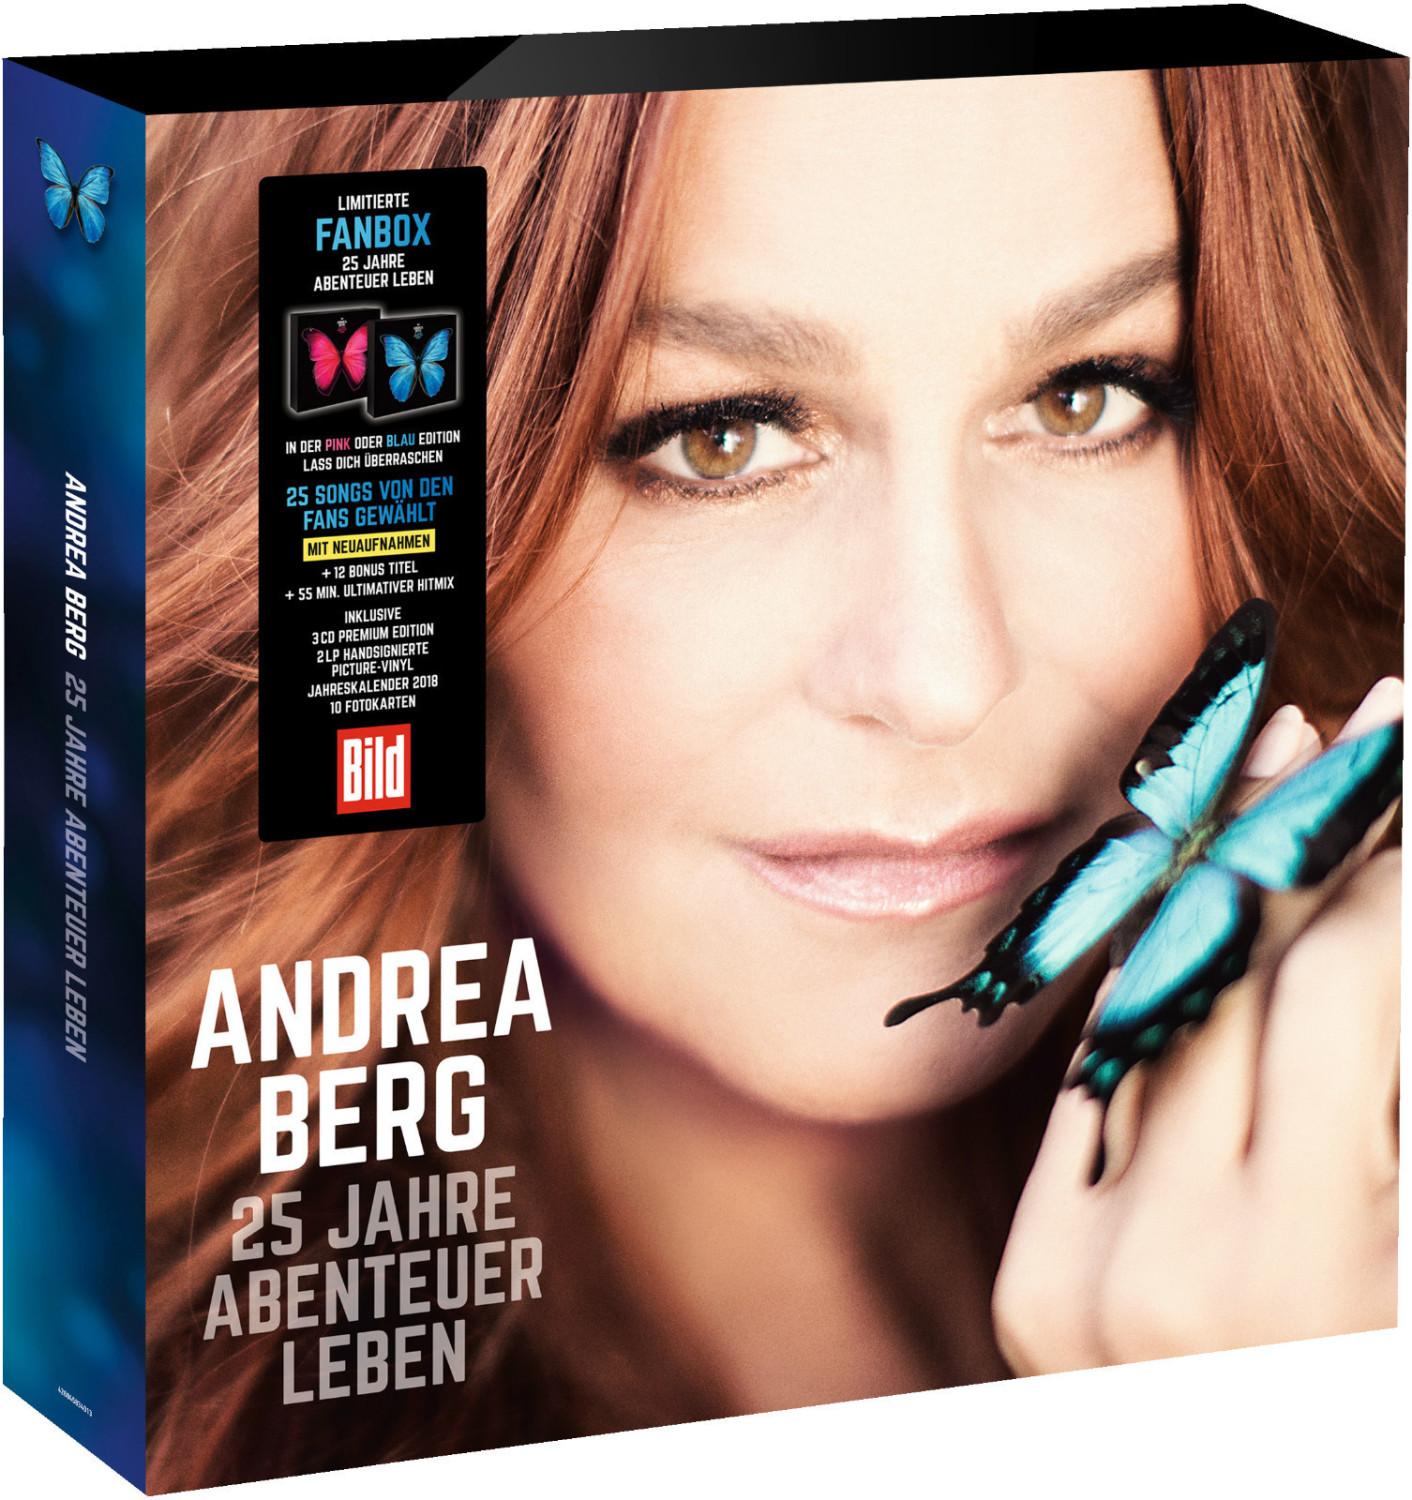 Andrea Berg - 25 Jahre Abenteuer Leben (ltd.Fanbox)